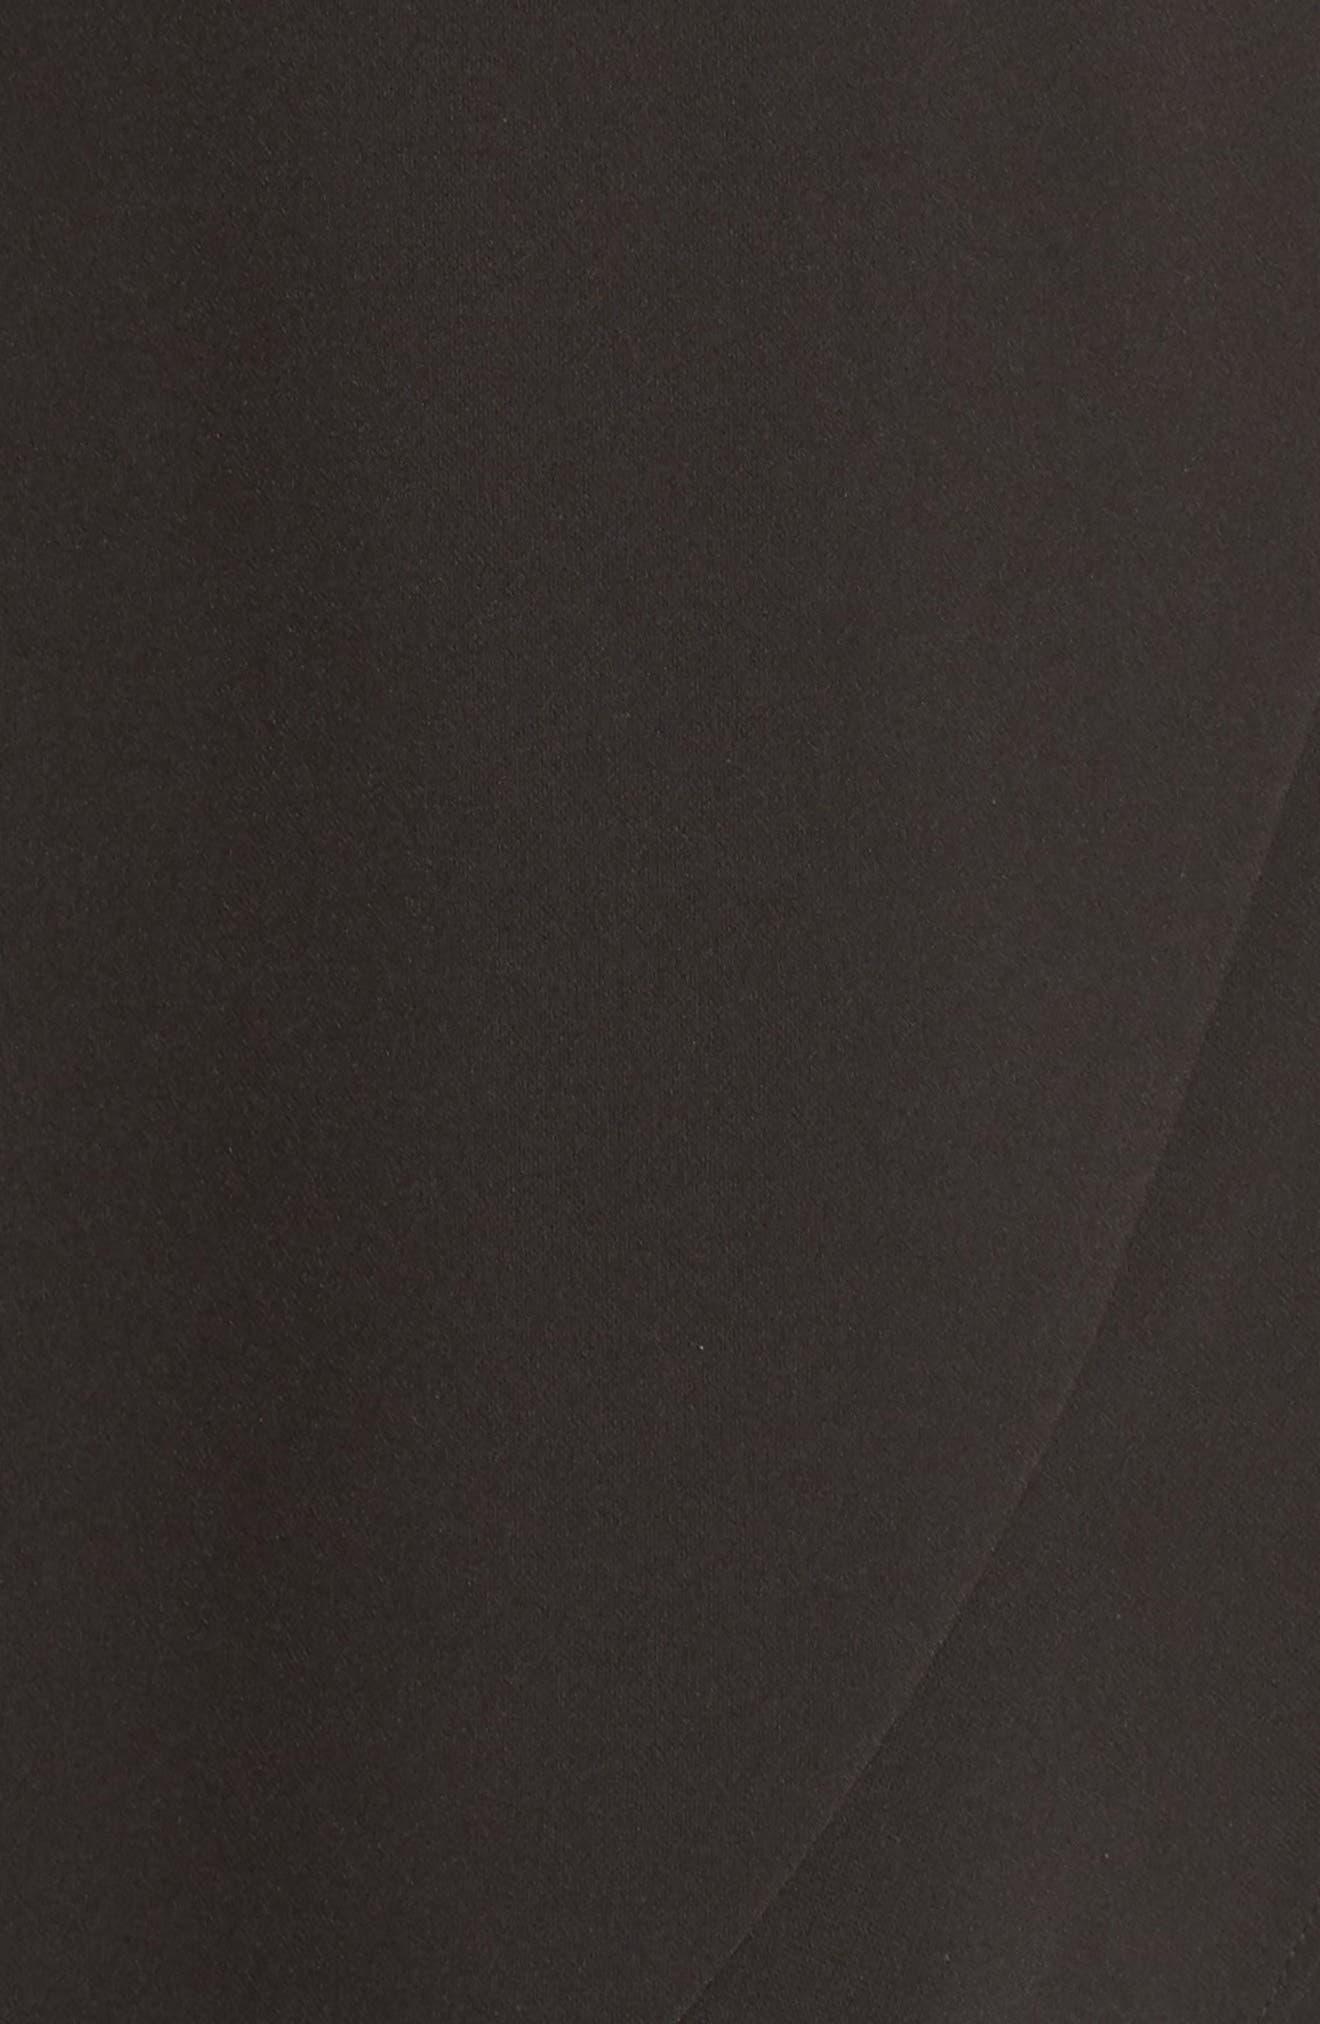 Cold Shoulder Ruffle Sheath Dress,                             Alternate thumbnail 6, color,                             001